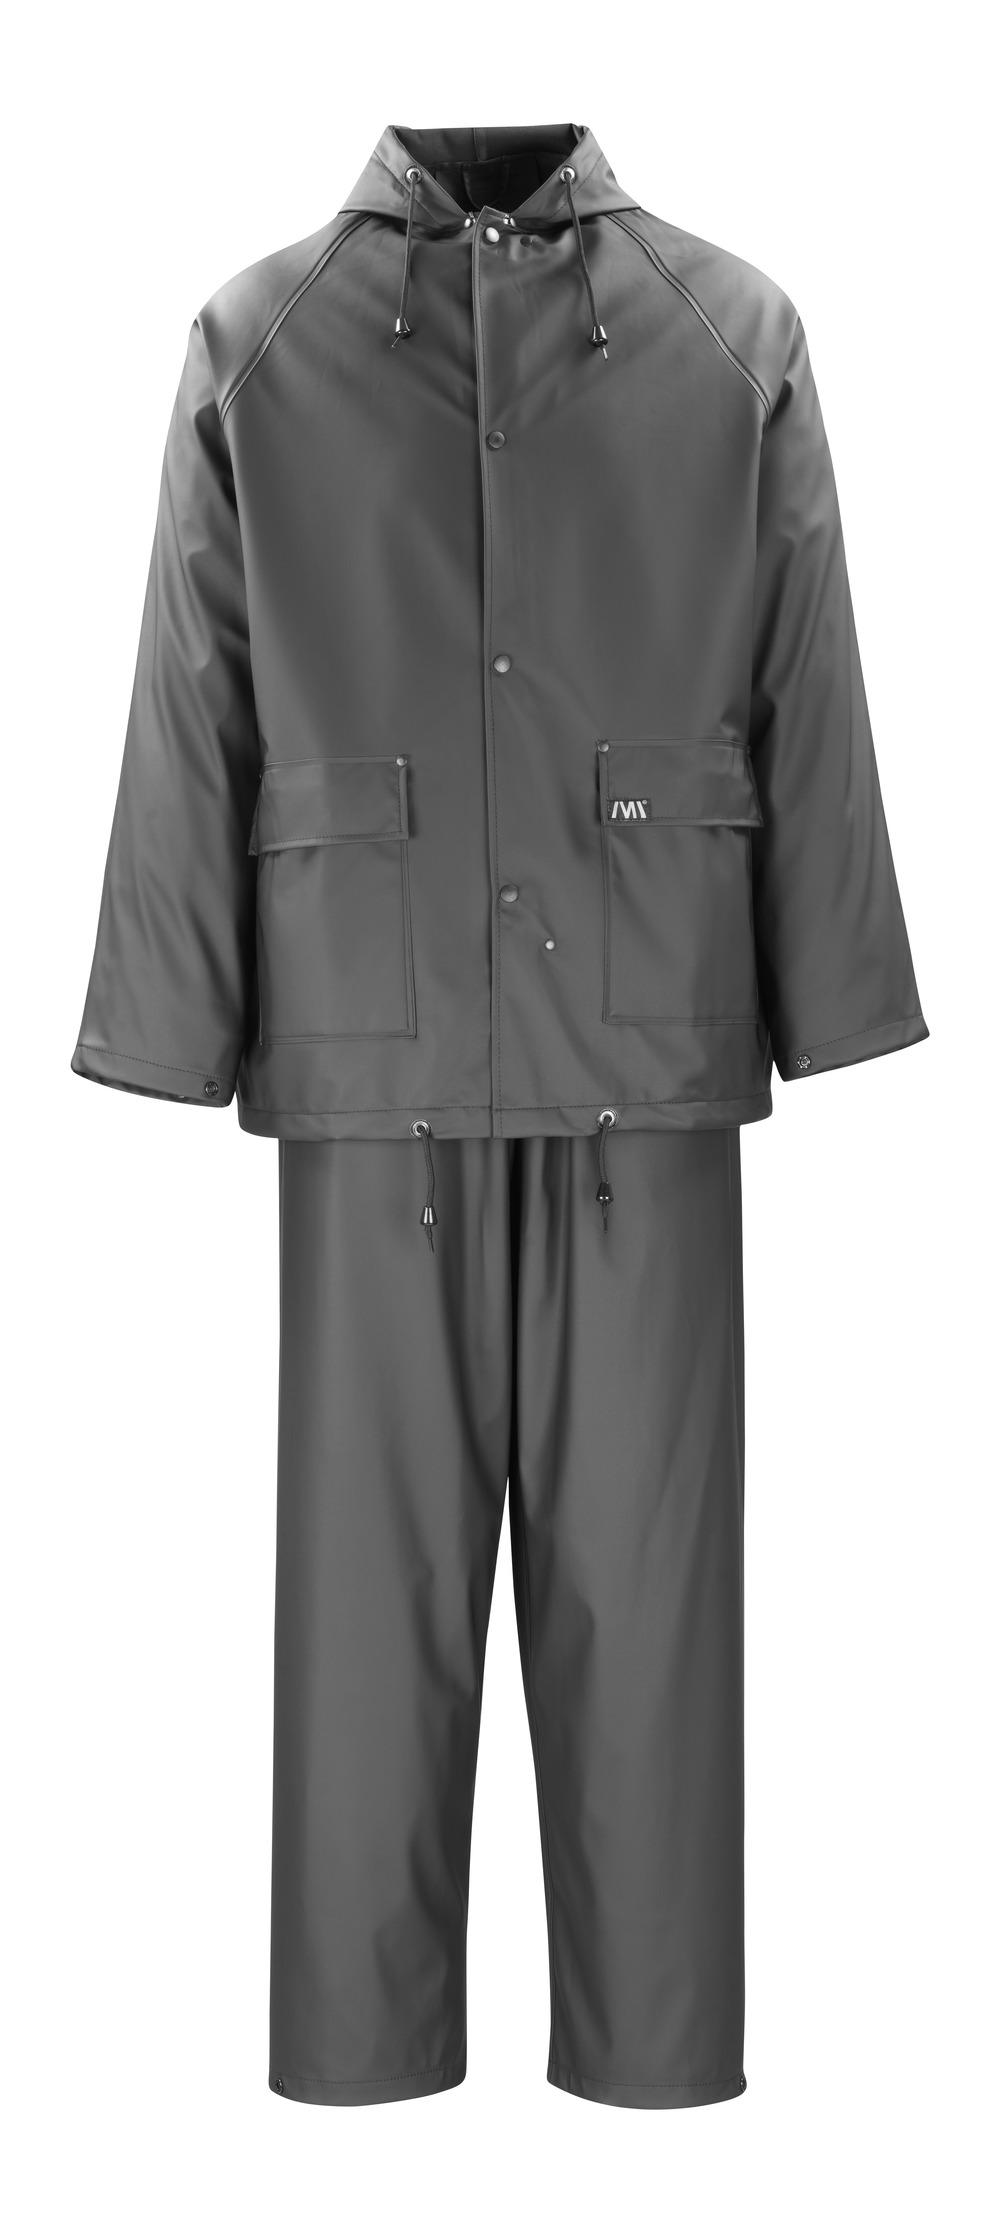 MASCOT PAVAO Rain Jacket and Pants